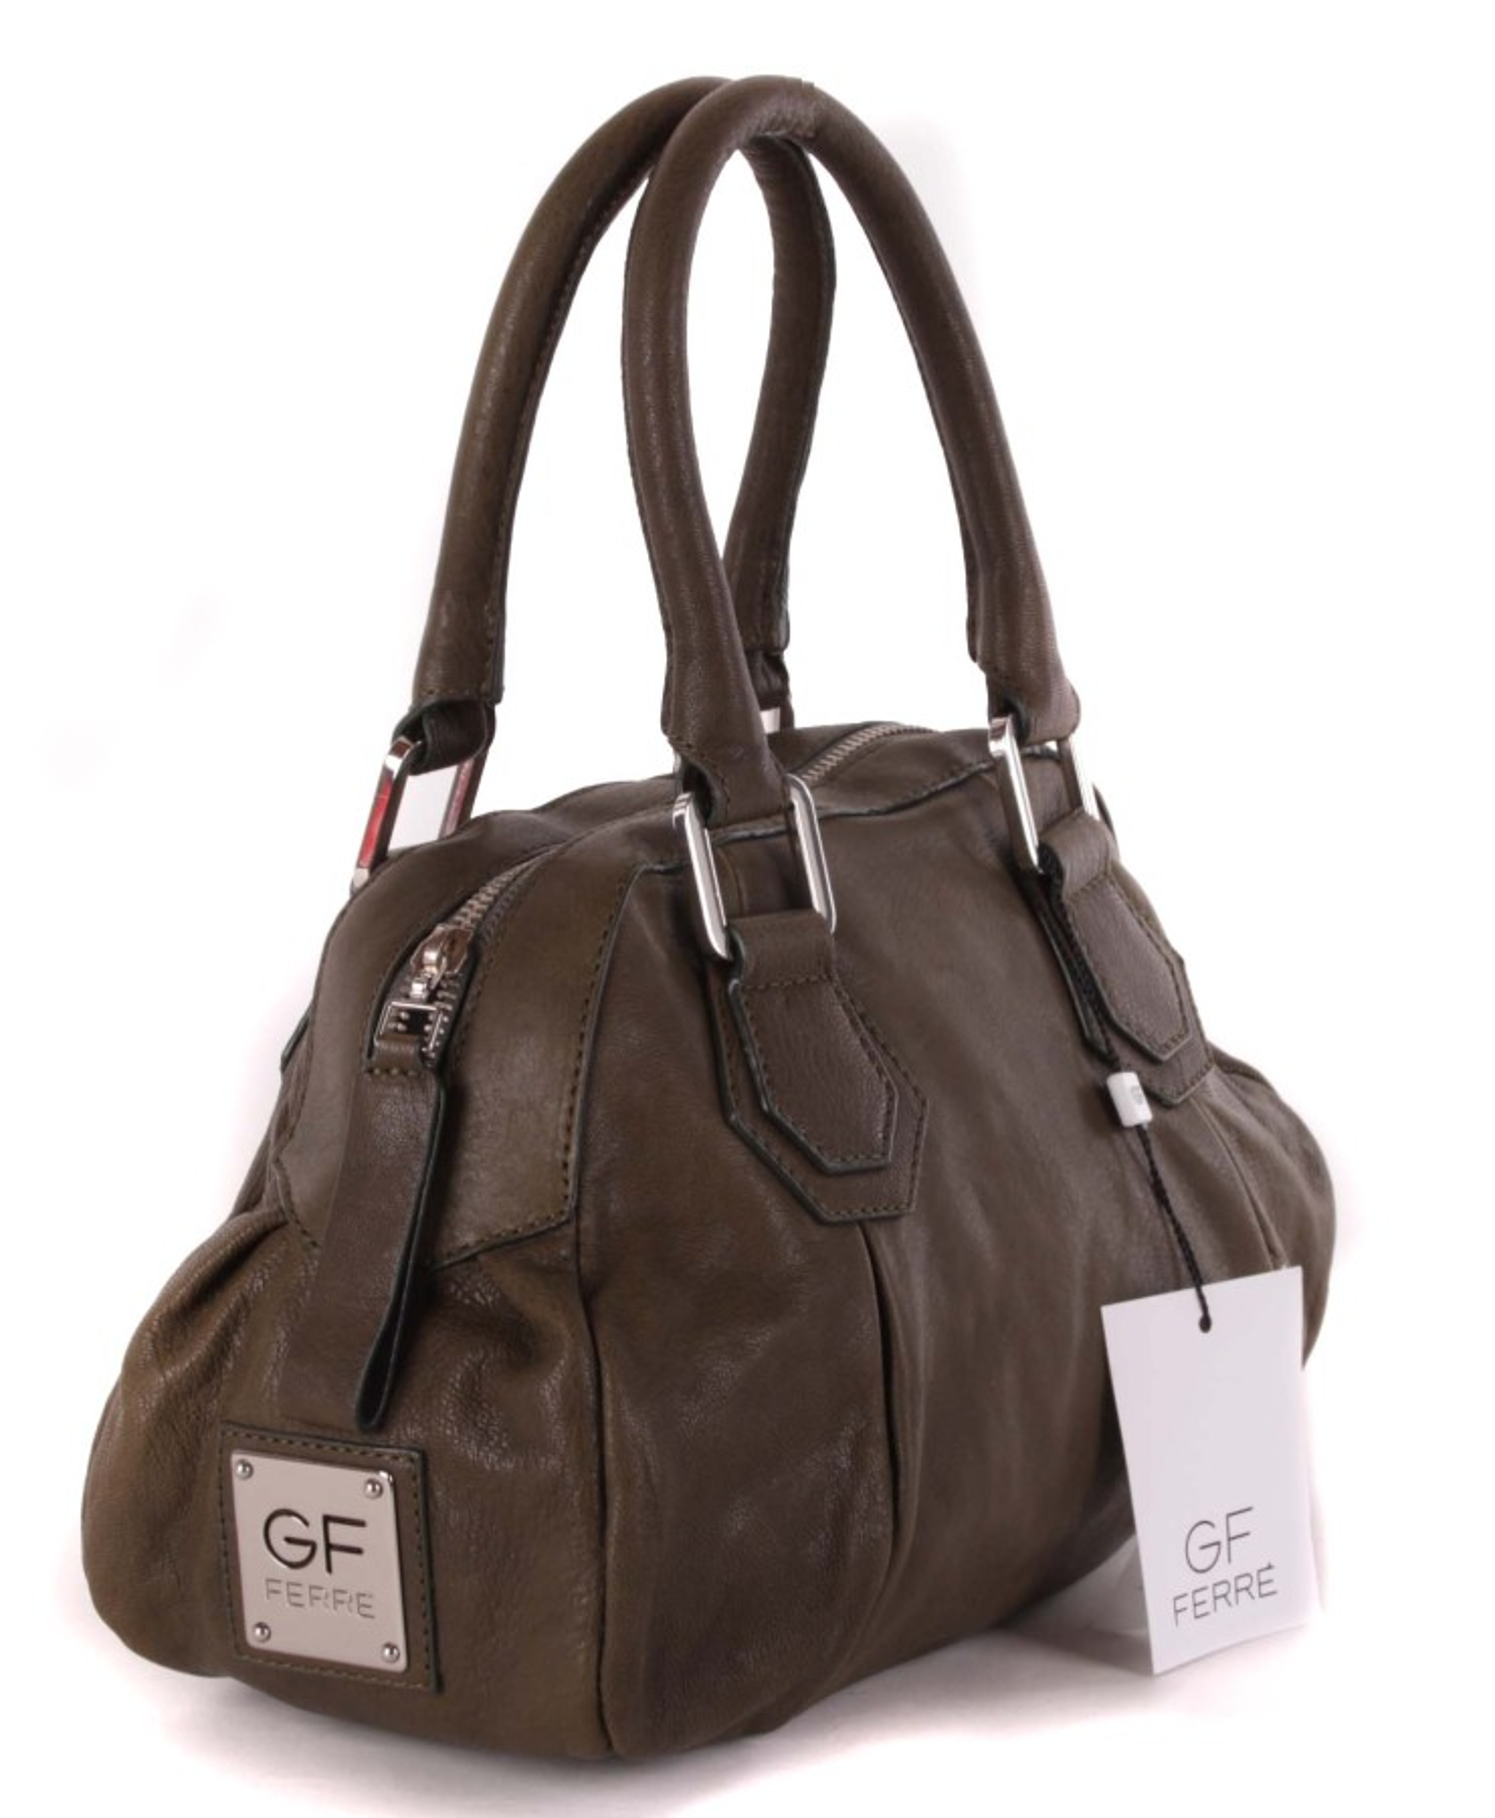 9dcc9ac6a2719 ... Gian Franco Ferre Damen Handtasche Tasche Leder Olivgrün X185 2 ...